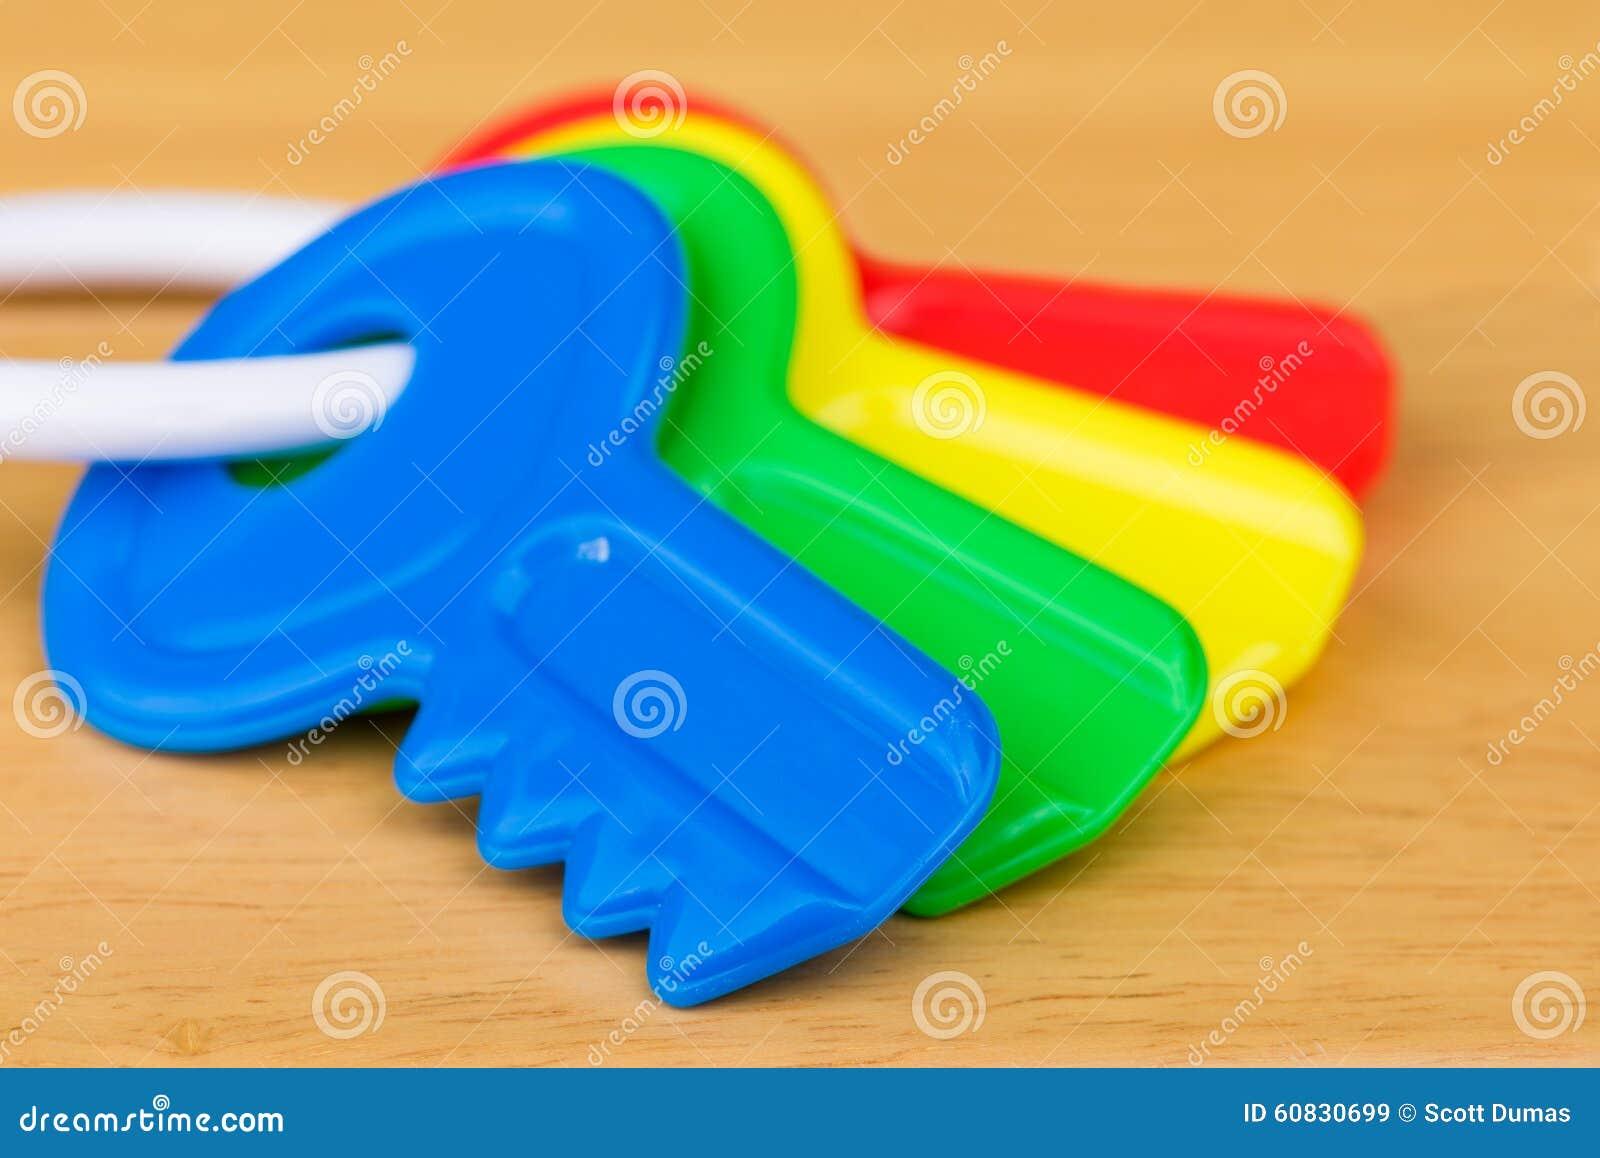 Kids Plastic Colorful Keys Stock Photo Image 60830699